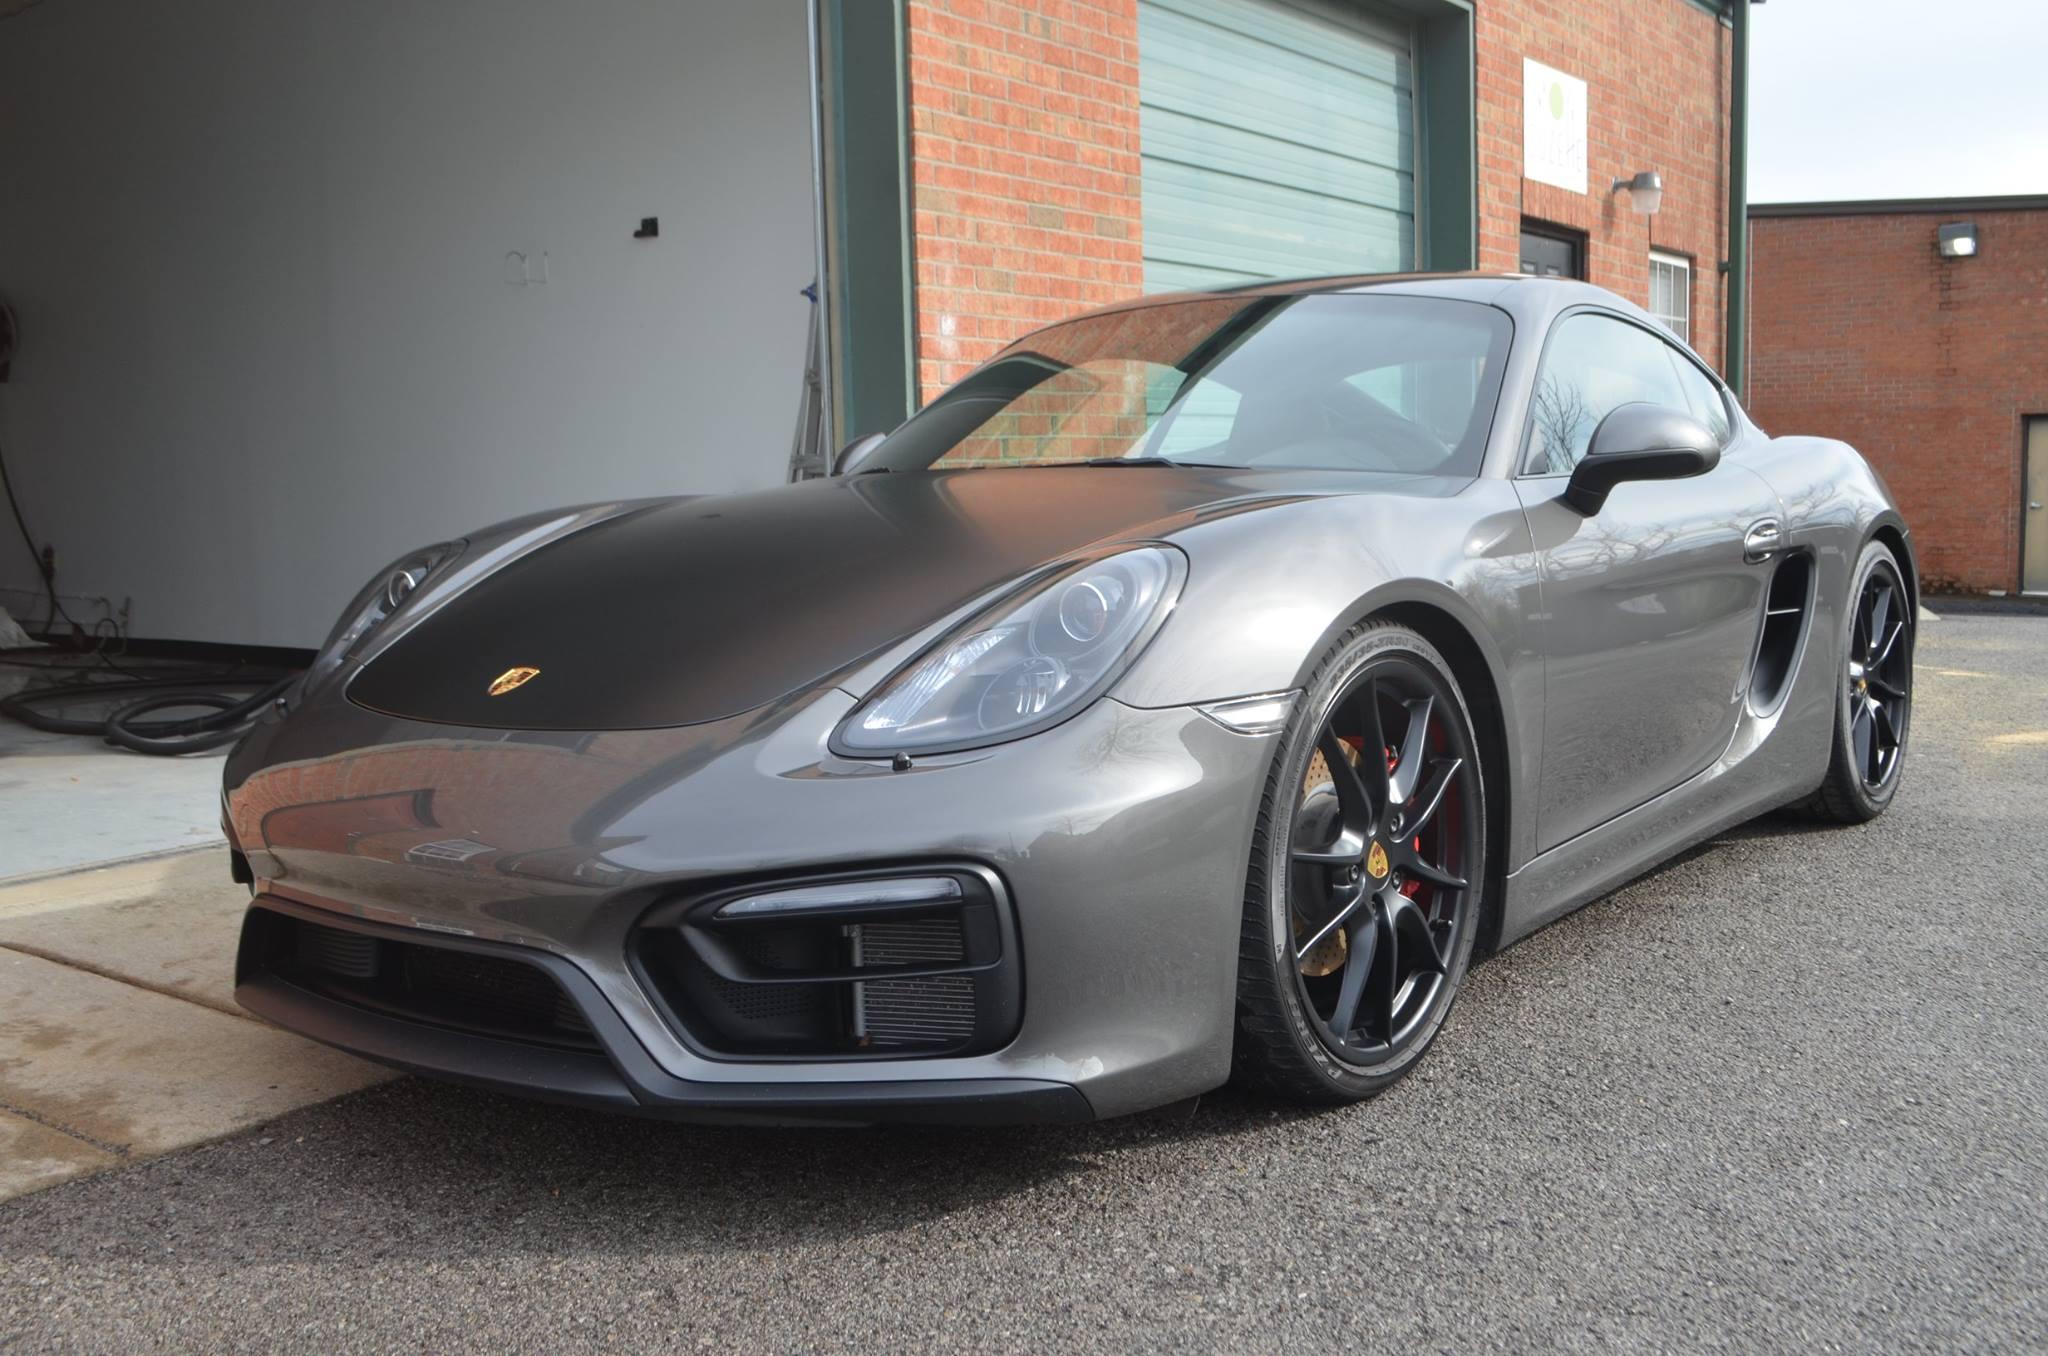 Porsche Cayman GTS: Track Pack PPF, Hood Color Change, CQ Professional